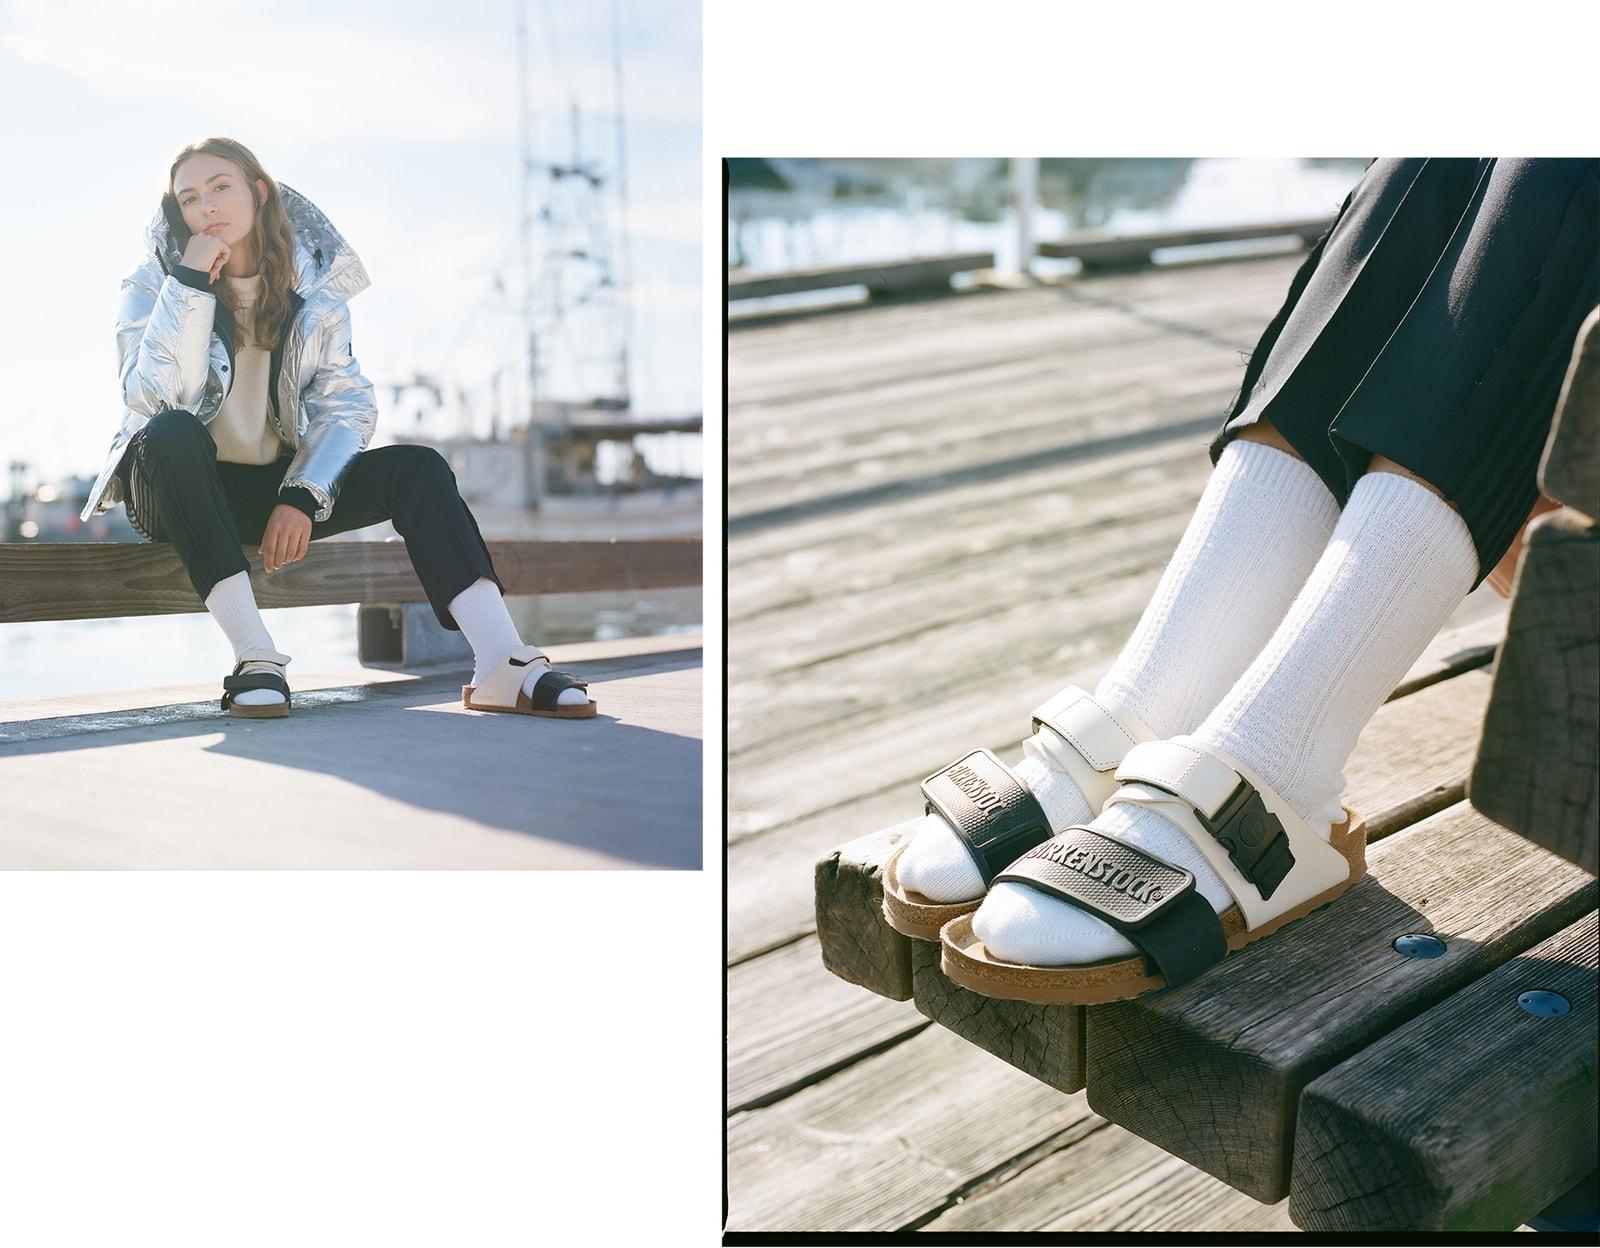 Birkenstock Rick Owens Sandals Spring Summer 2019 Victoria Beckham White Cashmere Sweater Kenzo Silver Puffer Jacket Metallic MM6 Maison Margiela Pants Black